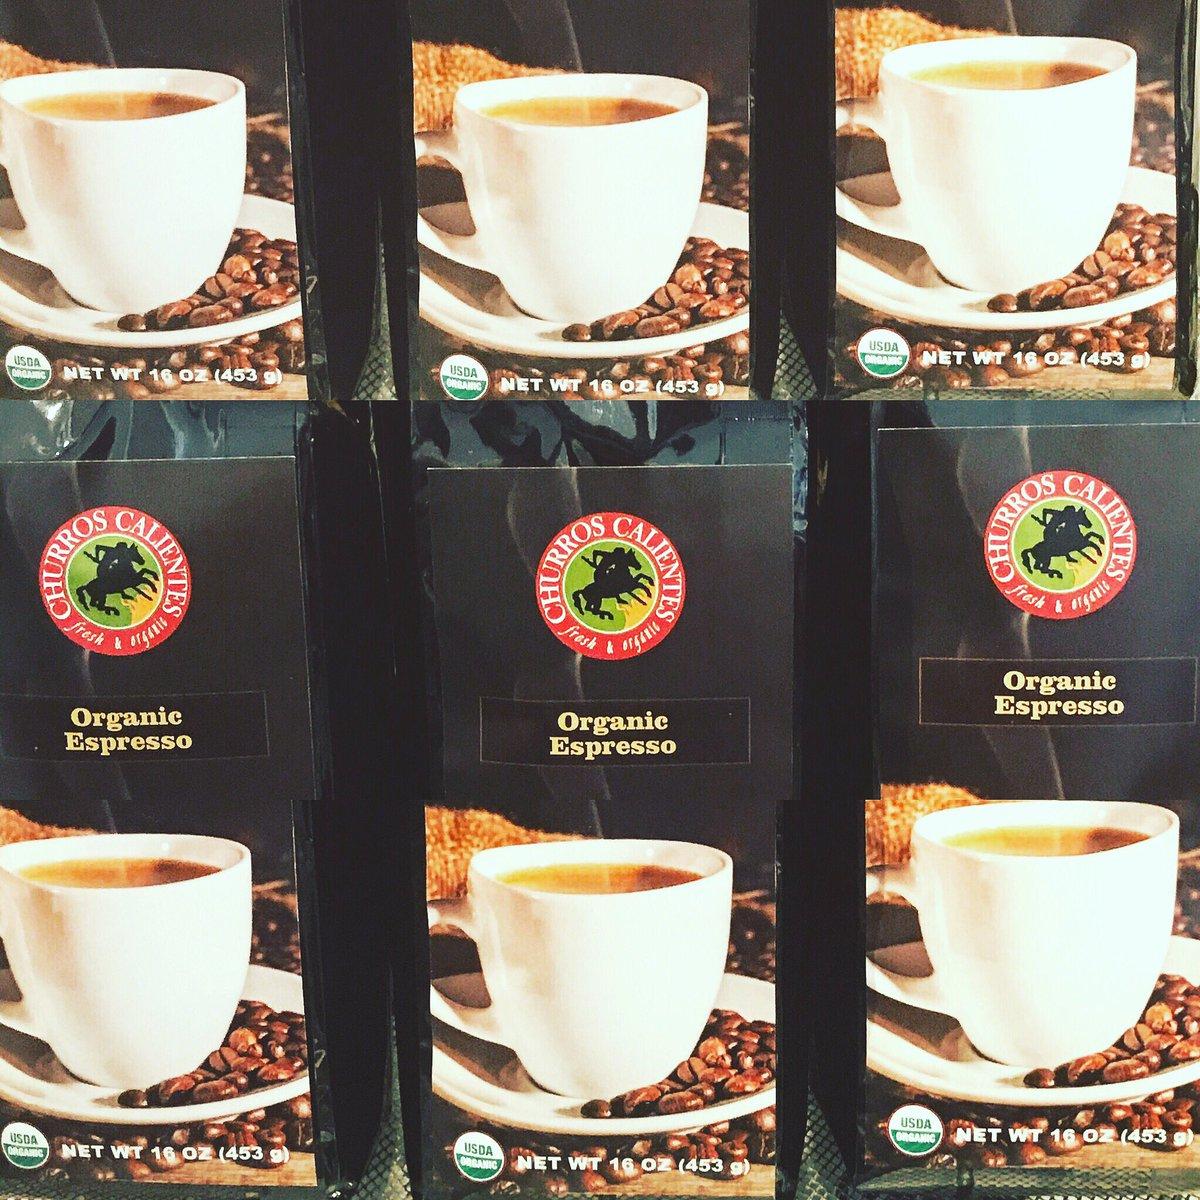 Churros Calientes On Twitter Organic Espresso Coffee Beans For Churroscalientes Delicious Foo Food Yummy Losangeles